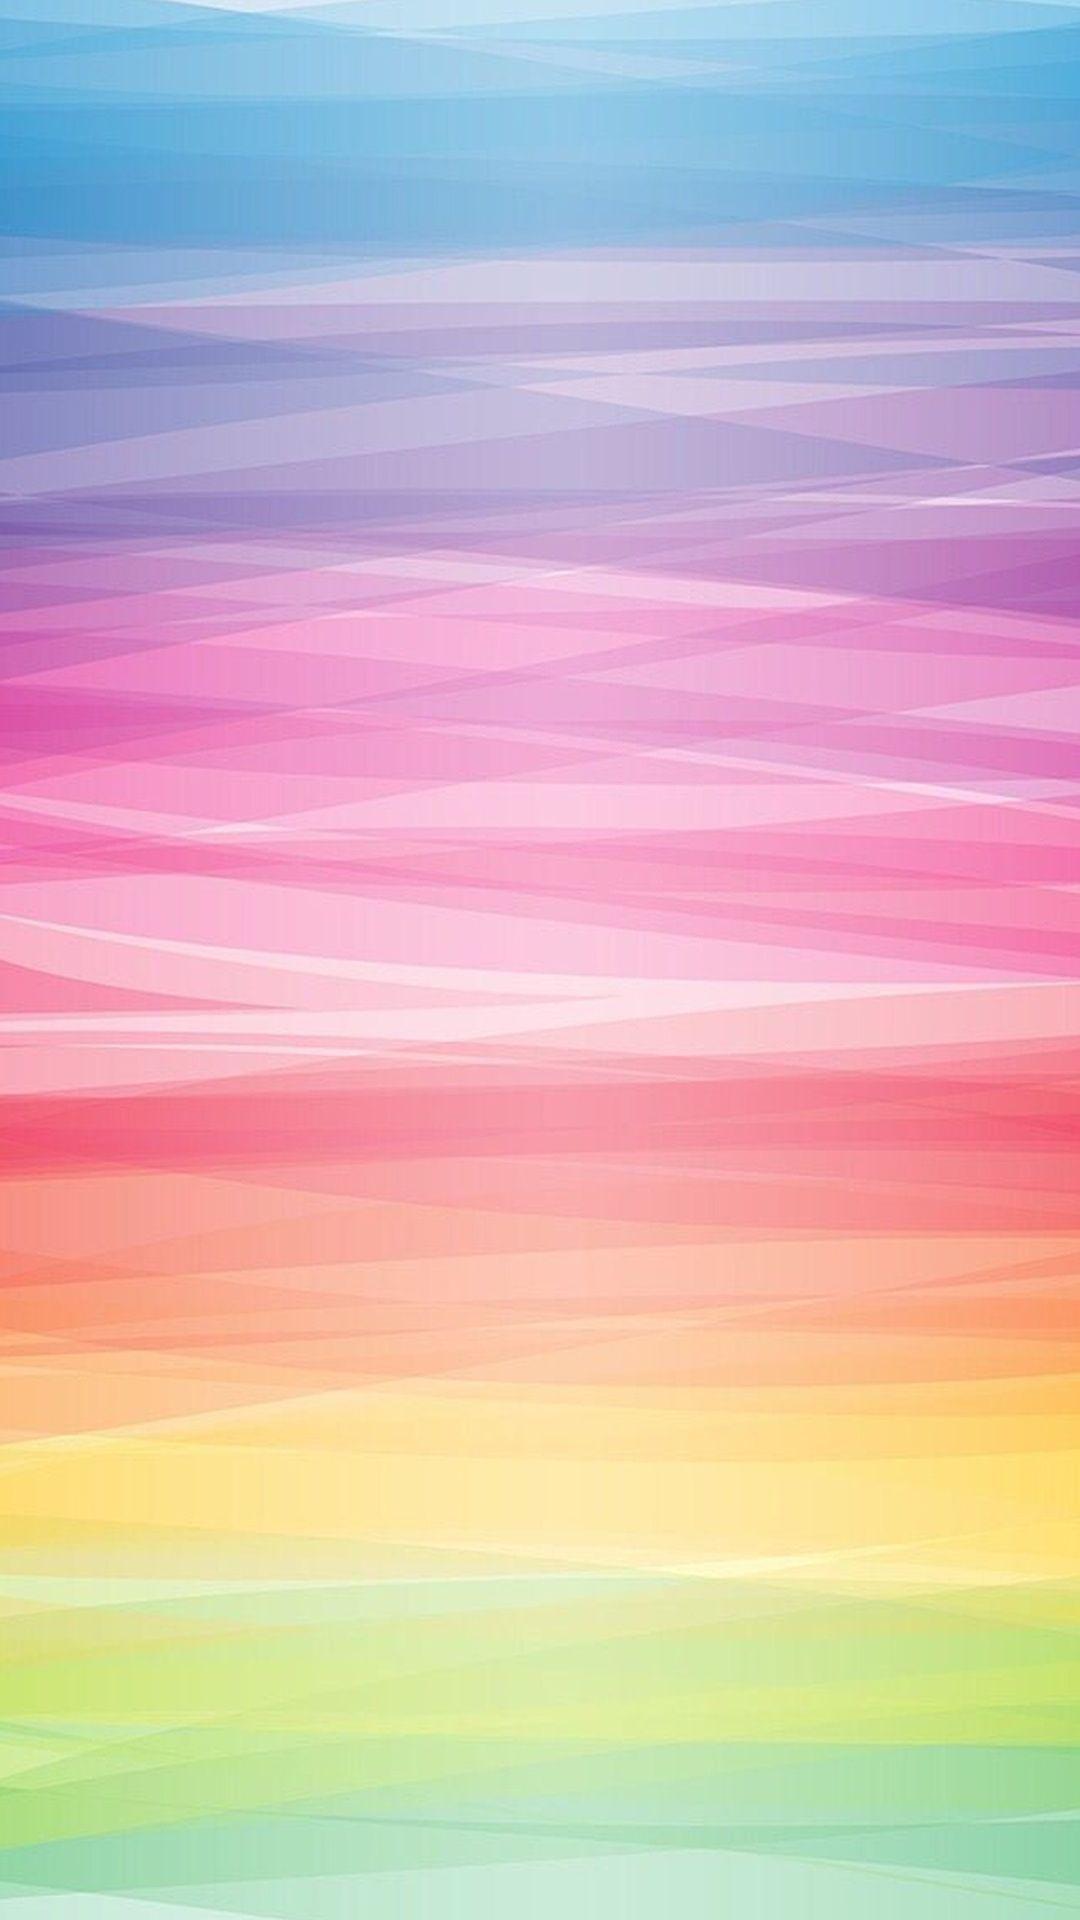 pretty pastel background wallpaper Pastel background